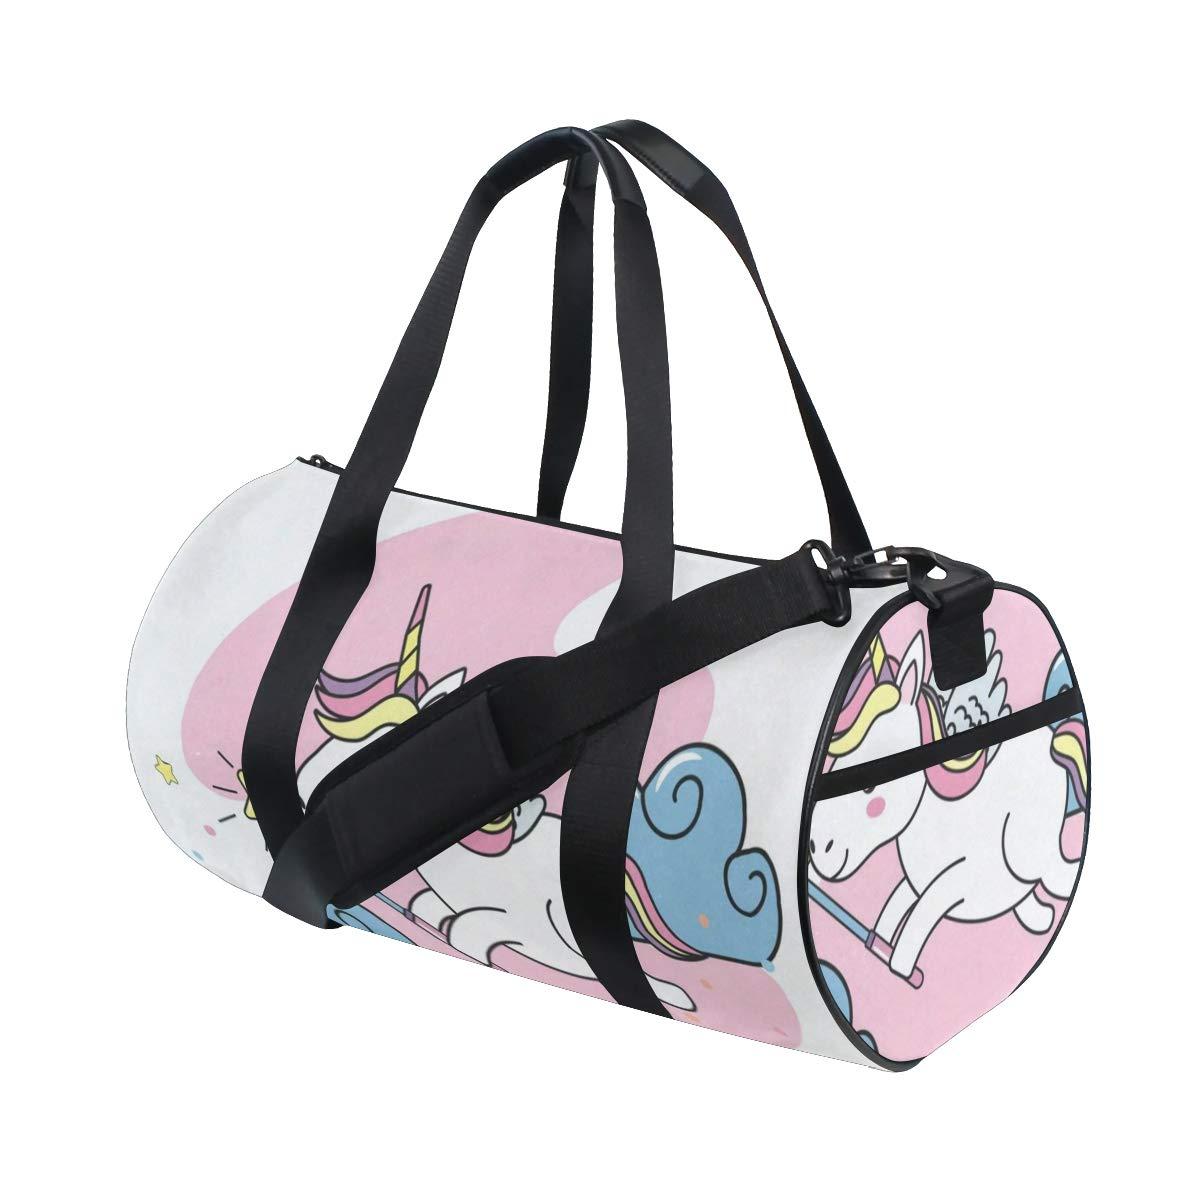 d64b2067395 Amazon.com | Cute Magic Unicorn Duffel Bag Sports Gym Bag Travel Weekender  Bag For Men and Women | Sports Duffels